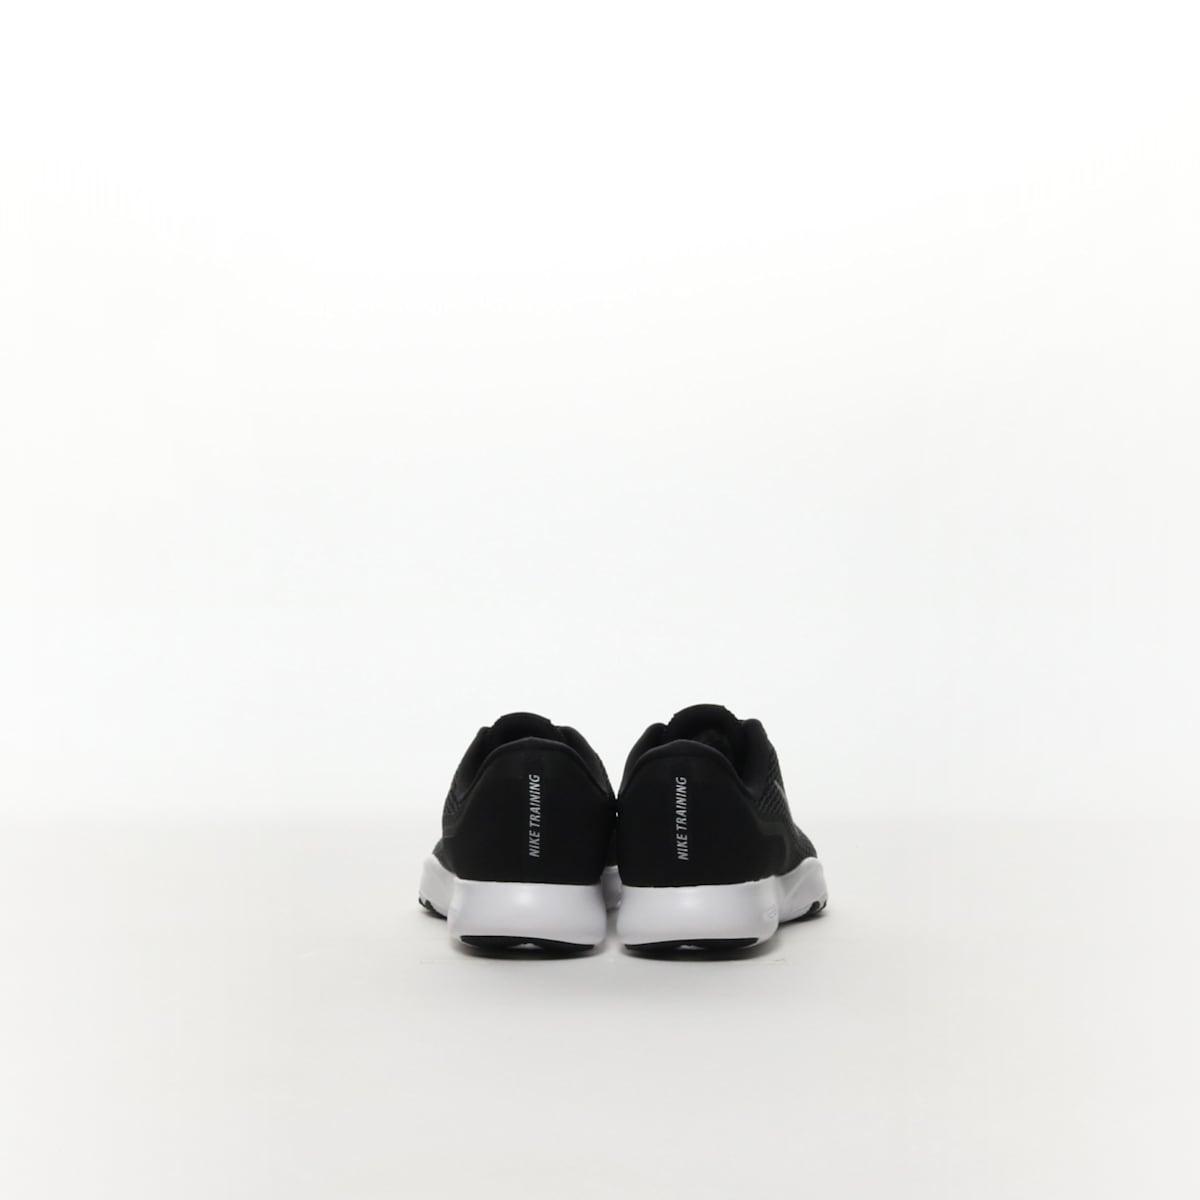 a3d4c751f32 Women s Nike Flex TR 7 (W) Training Shoe - BLACK M SILV – Resku